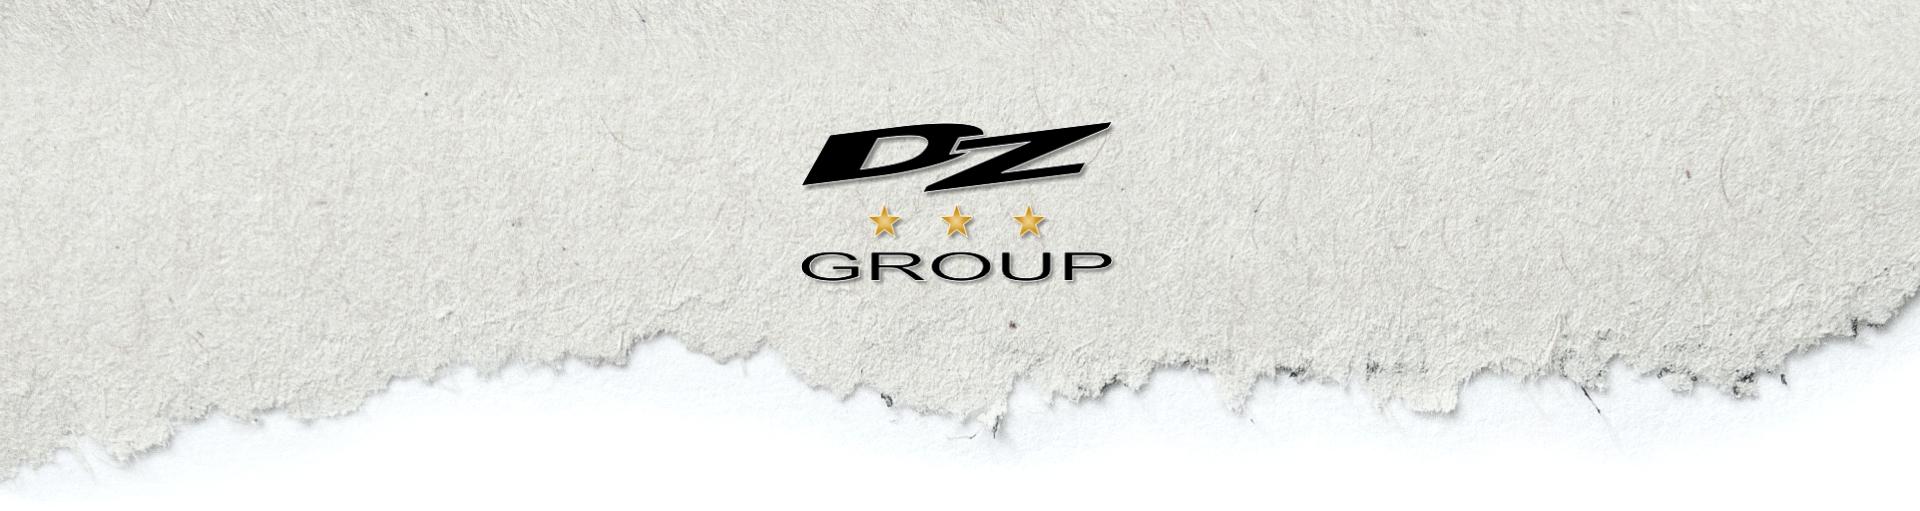 DZ Group